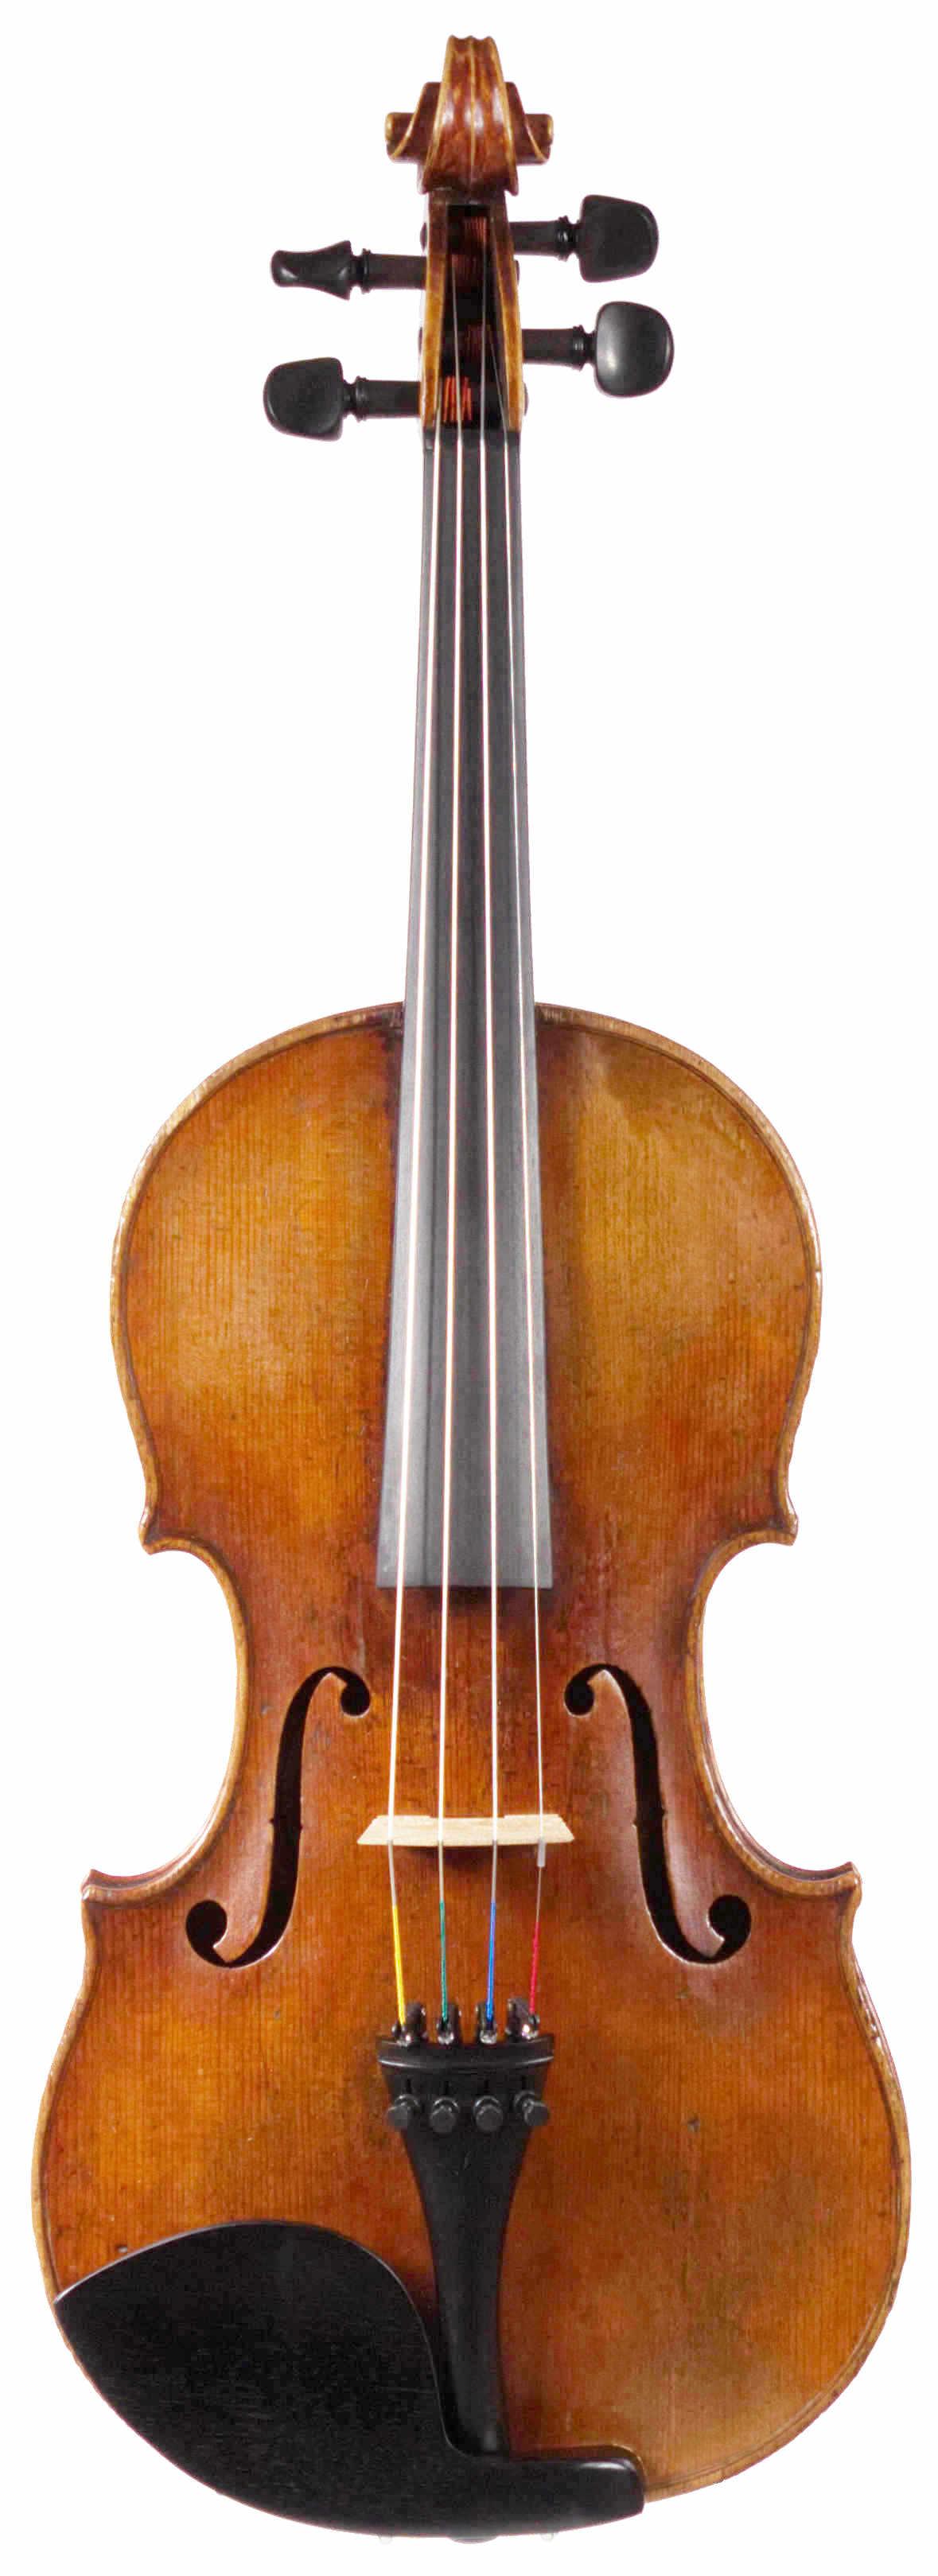 Thibout violin